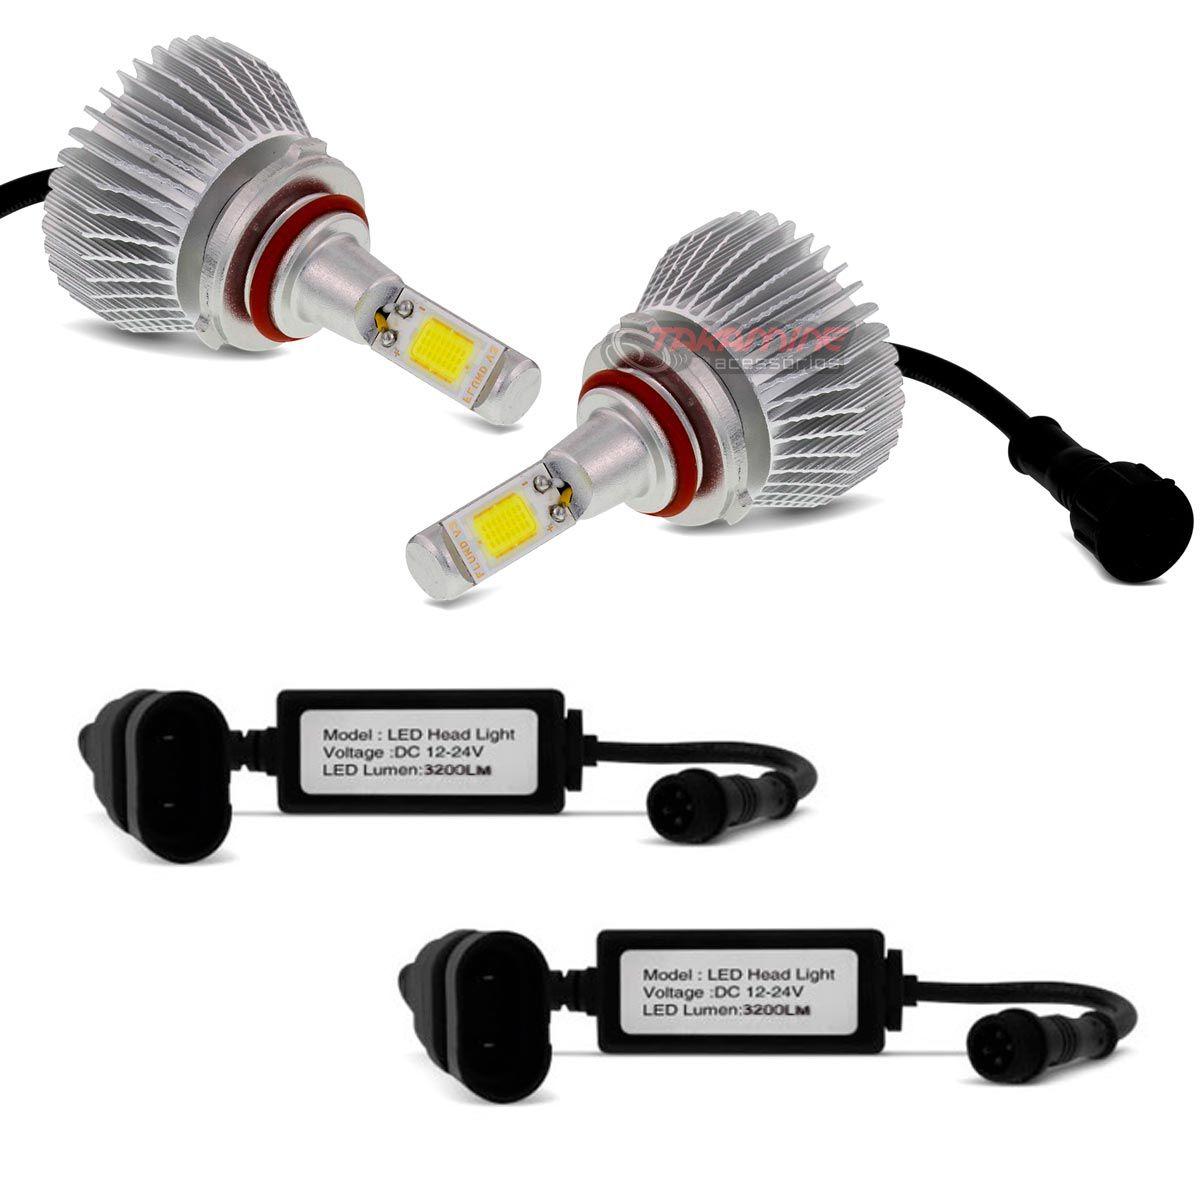 Kit LED 2D Headlight Shocklight tipo xenon Corolla 2015 2016 2017 - farol baixo HB3 35